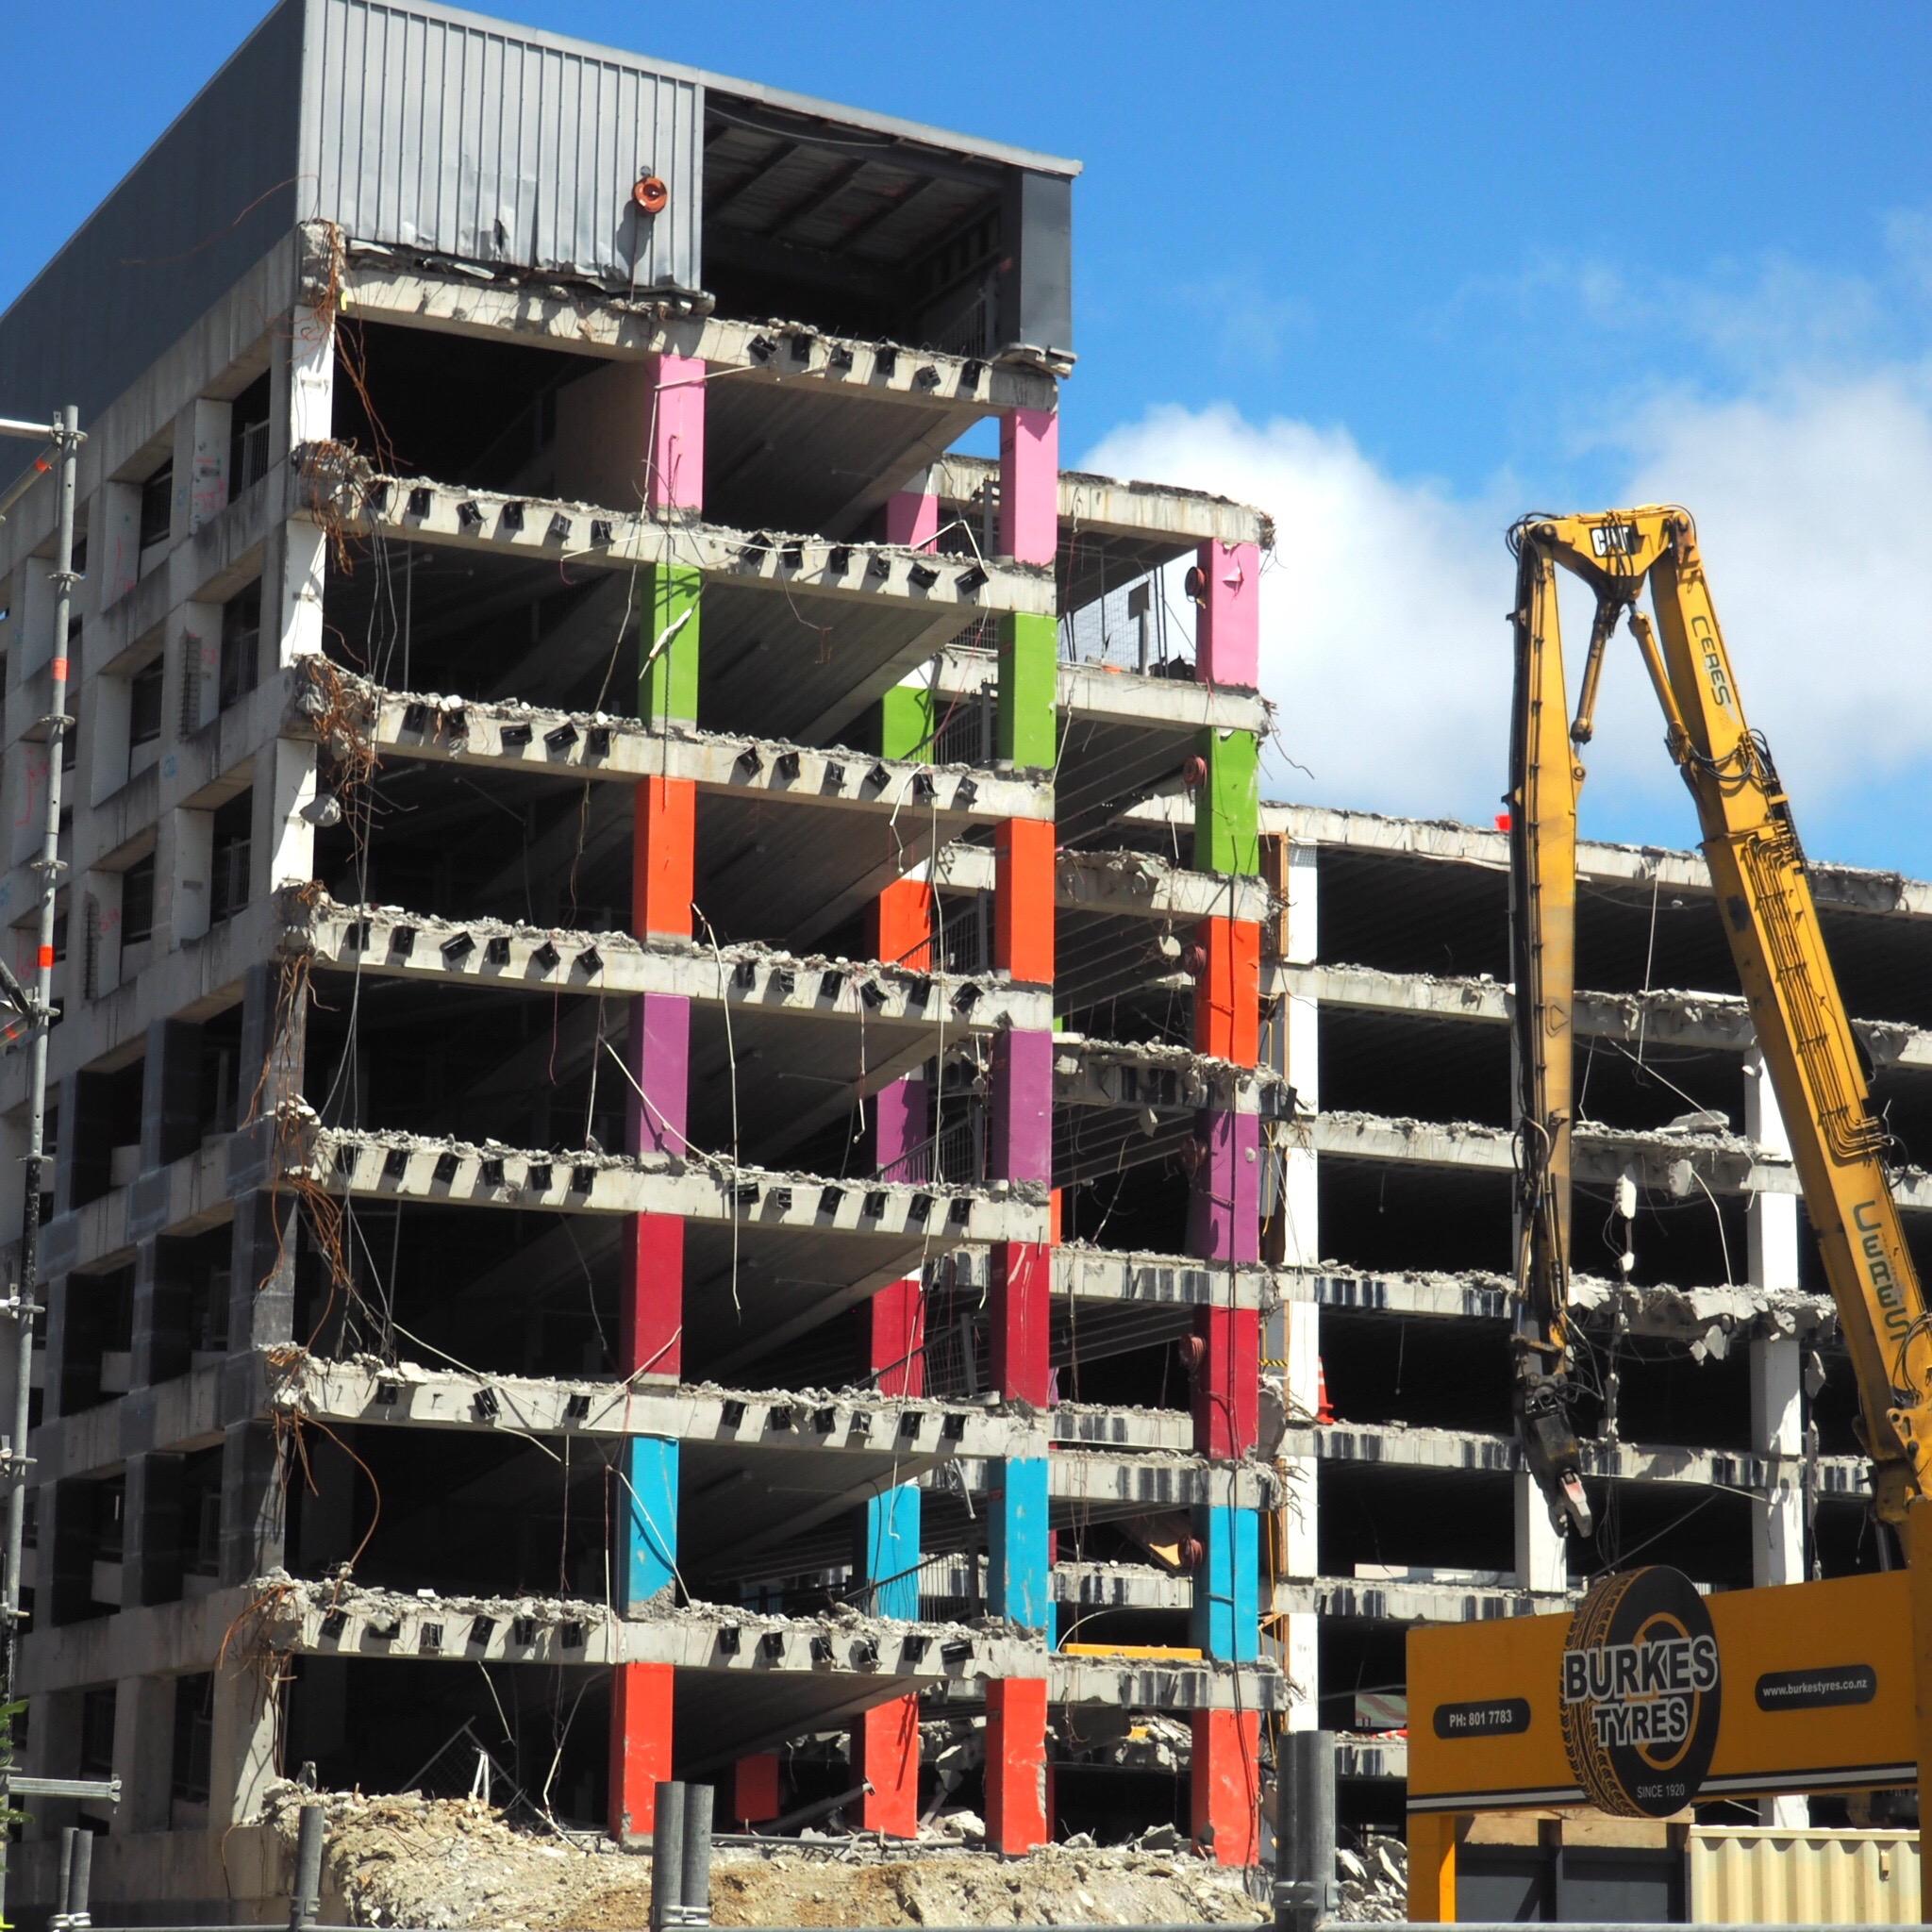 The reading cinema car park. wellington. being demolished because of earthquake damage.